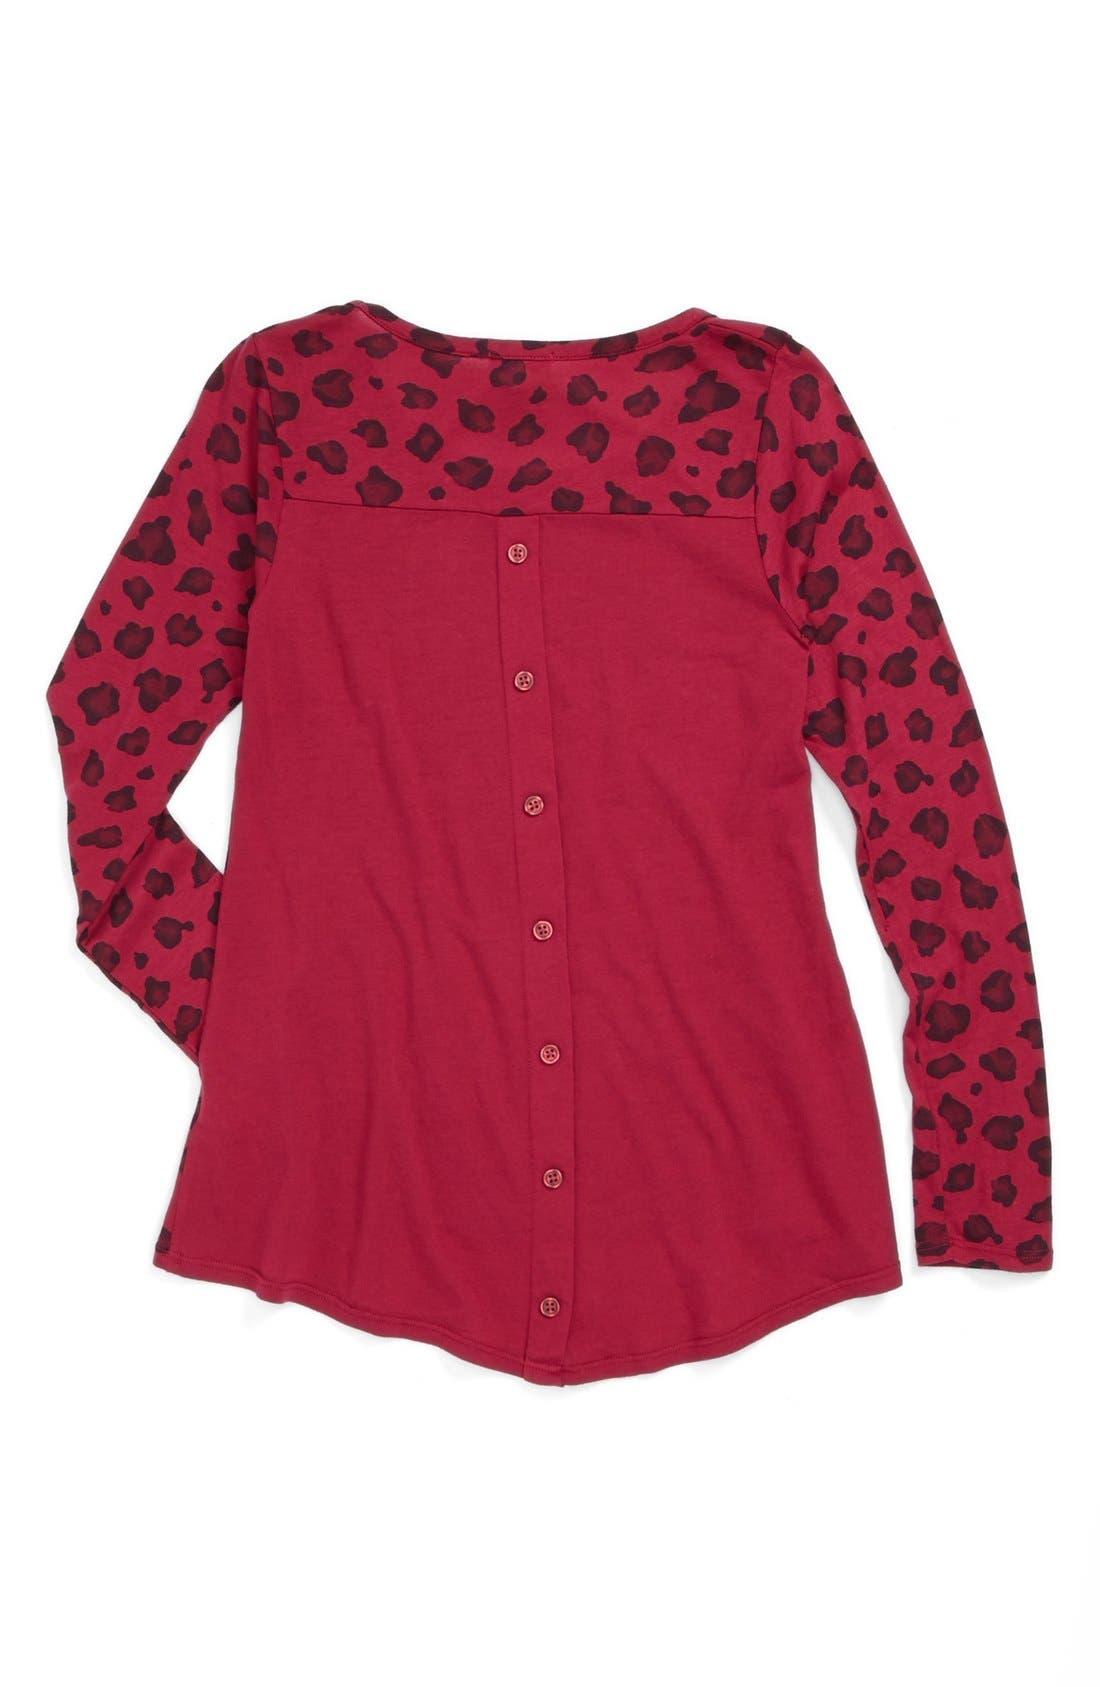 Alternate Image 2  - Splendid Leopard Print High/Low Top (Big Girls)